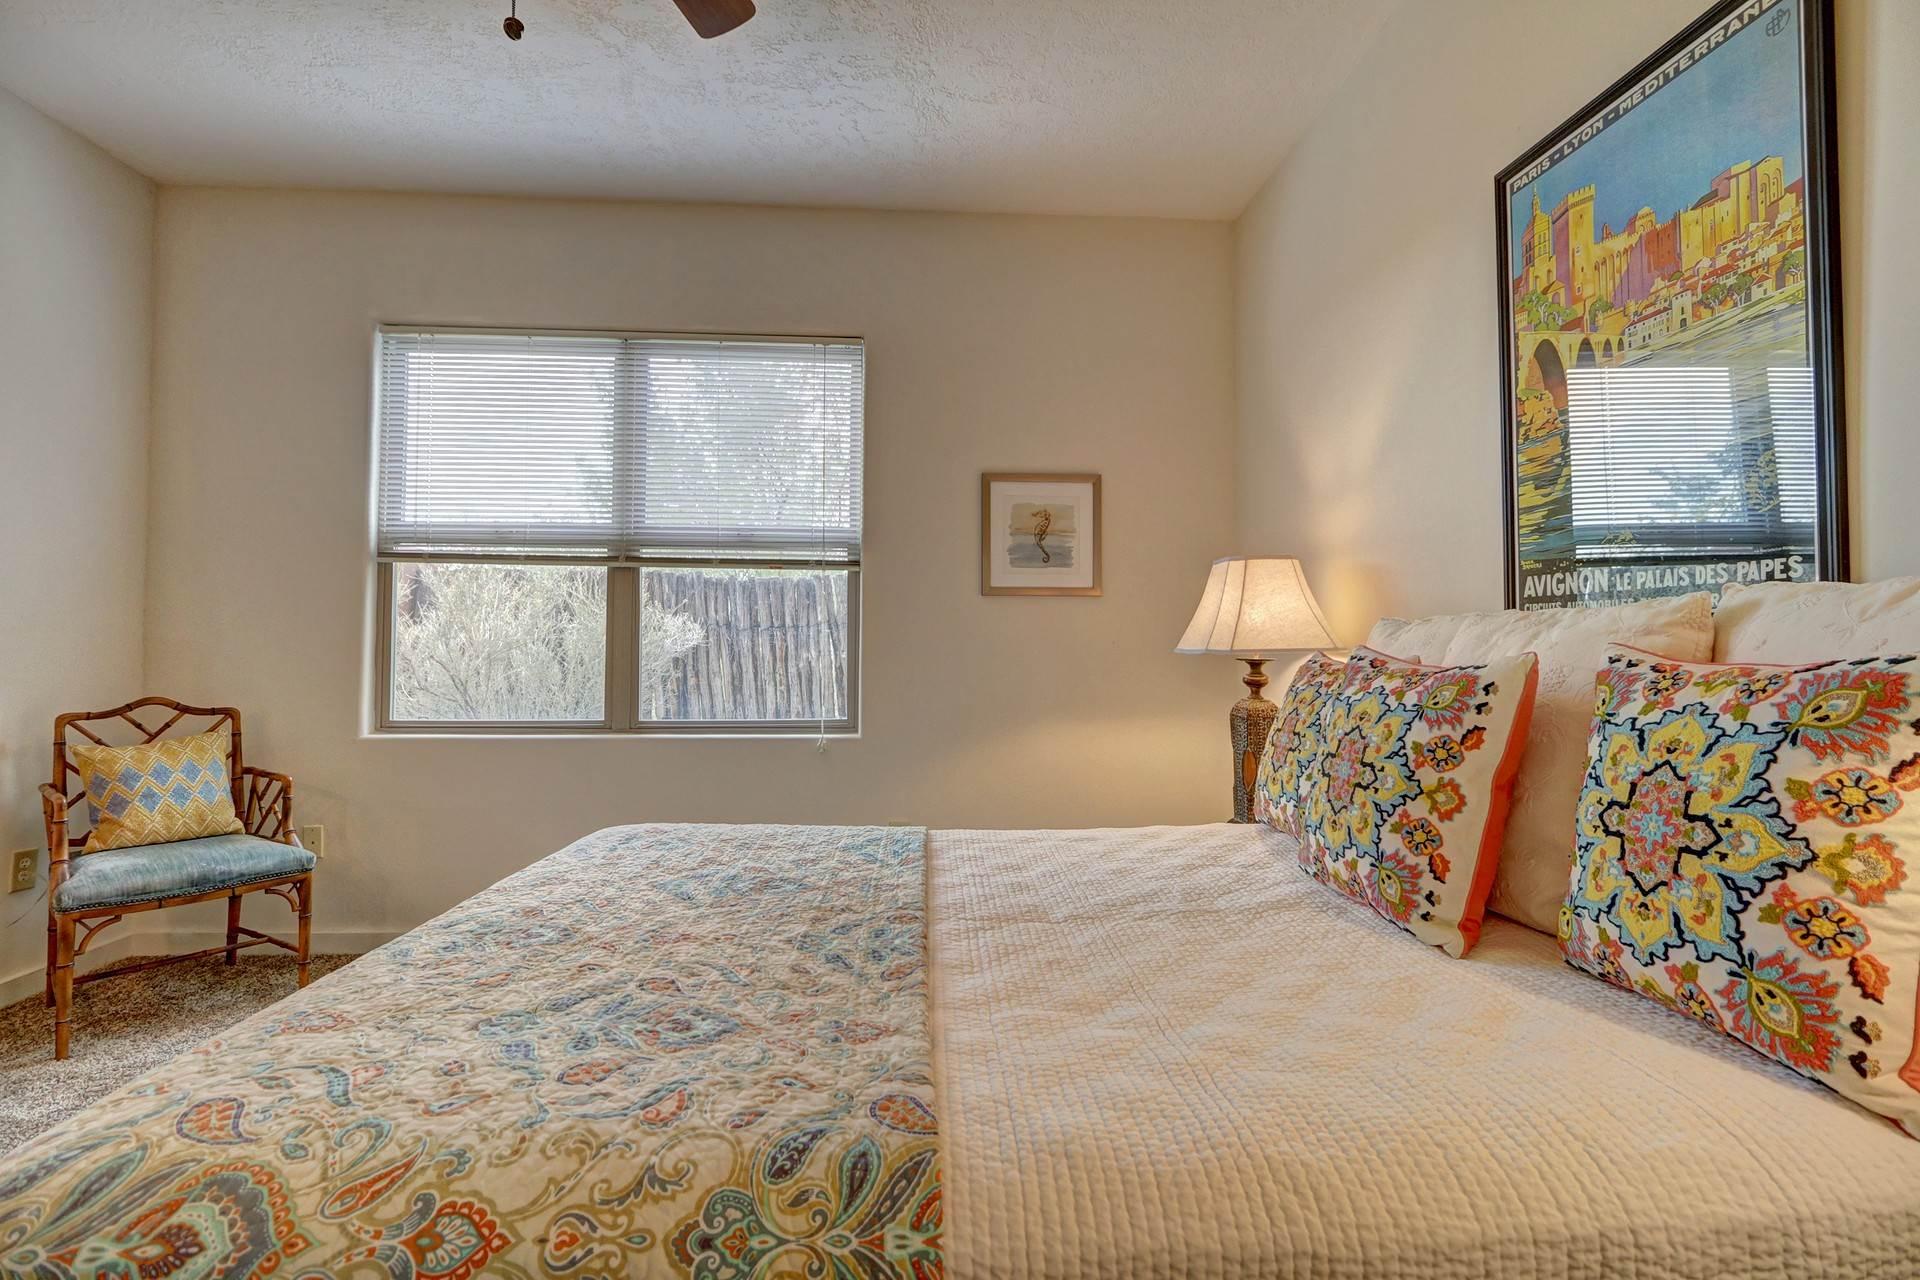 500 Rodeo, Santa Fe, New Mexico 87505, 2 Bedrooms Bedrooms, ,2 BathroomsBathrooms,Condominium,For Sale,500 Rodeo,202002662